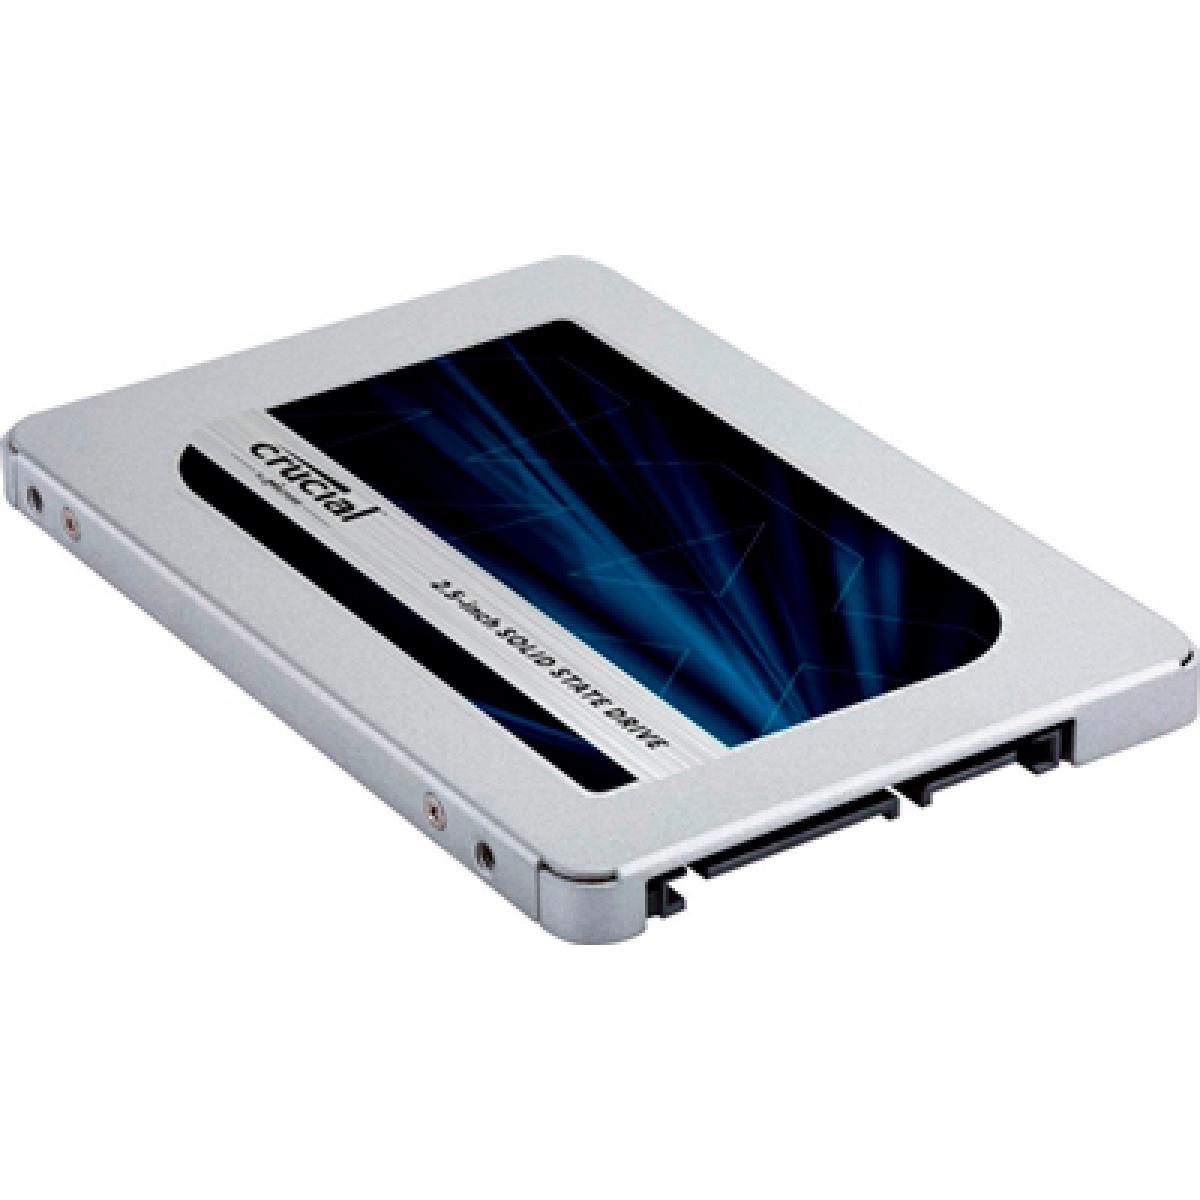 SSD Crucial MX500, 250GB, Sata III, Leitura 560MB/S Gravação 510MB/s, CT250MX500SSD1 - Open Box